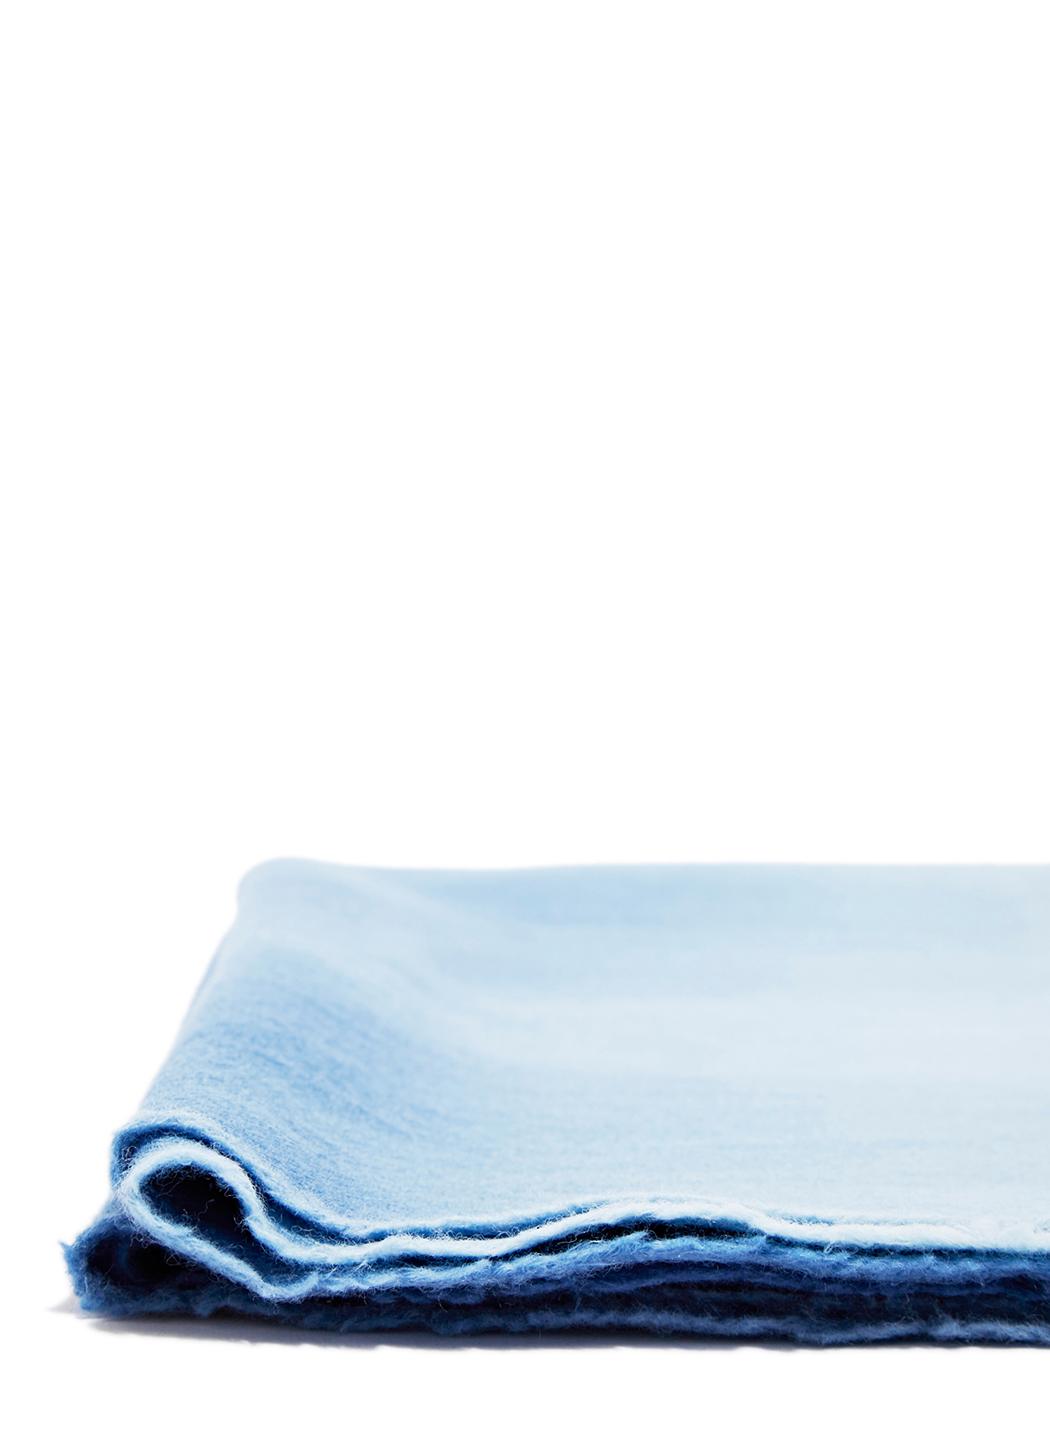 Sylvan foulard en pure laine ombr d in blue lyst for Sylvan app